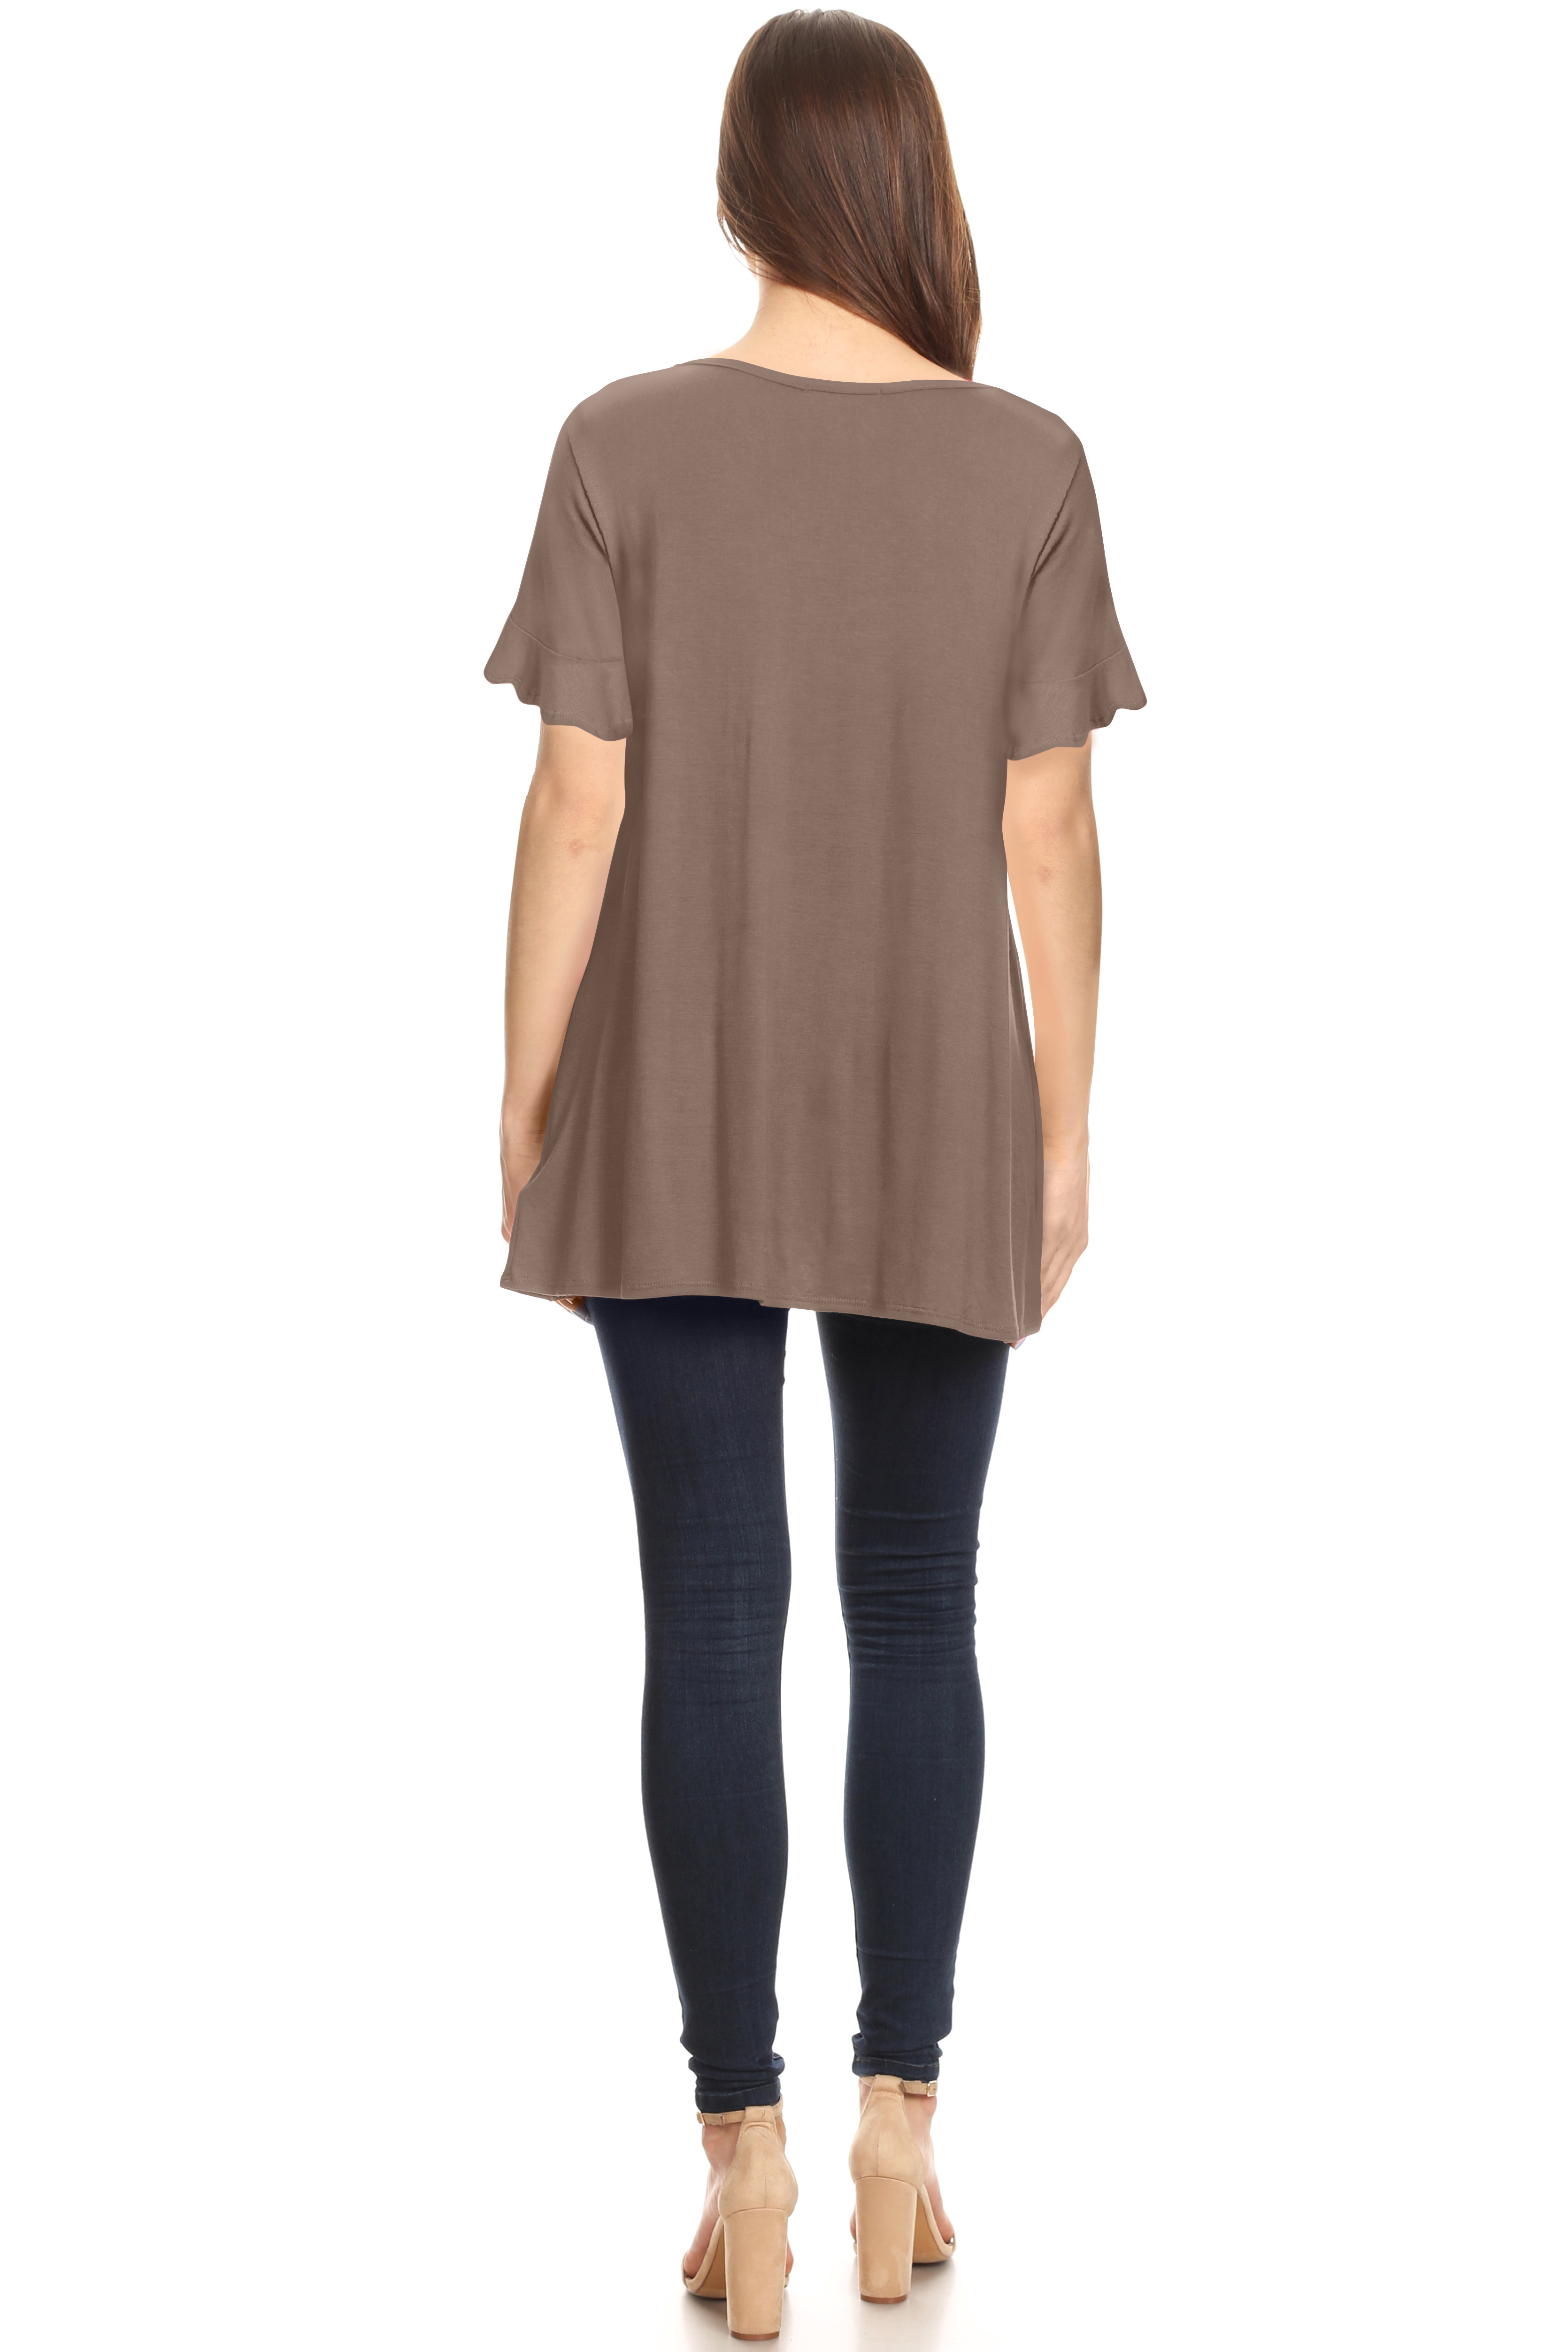 aaa2b6f53ad5c8 Simlu - Womens Ruffle Sleeve Tunic Tops to Wear with Leggings - Walmart.com